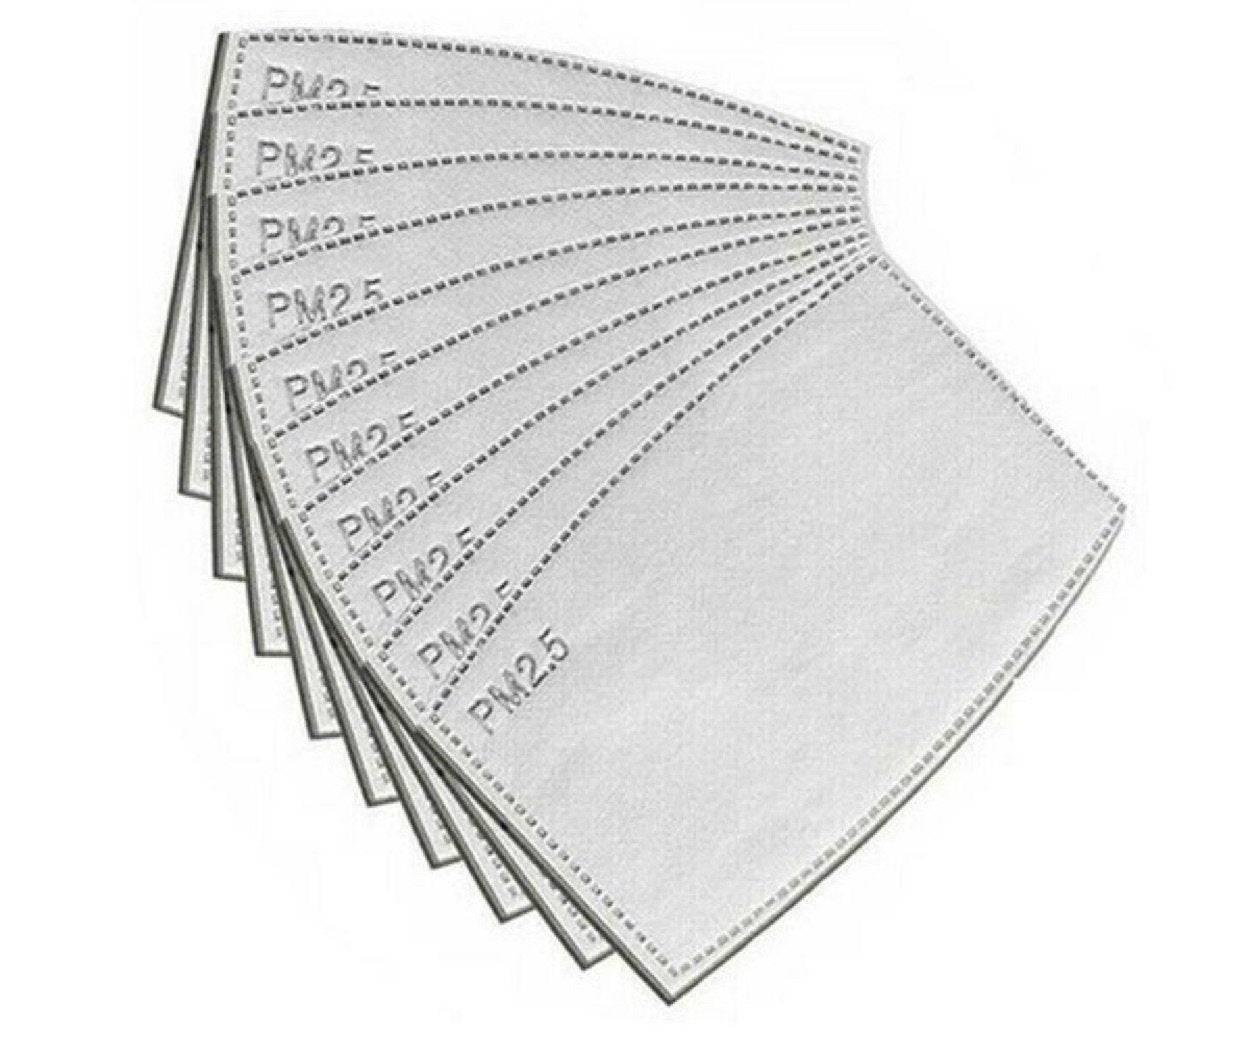 MASQUES DIRECT 30 Filtres pour masques (Protection Maximum) PM2.5